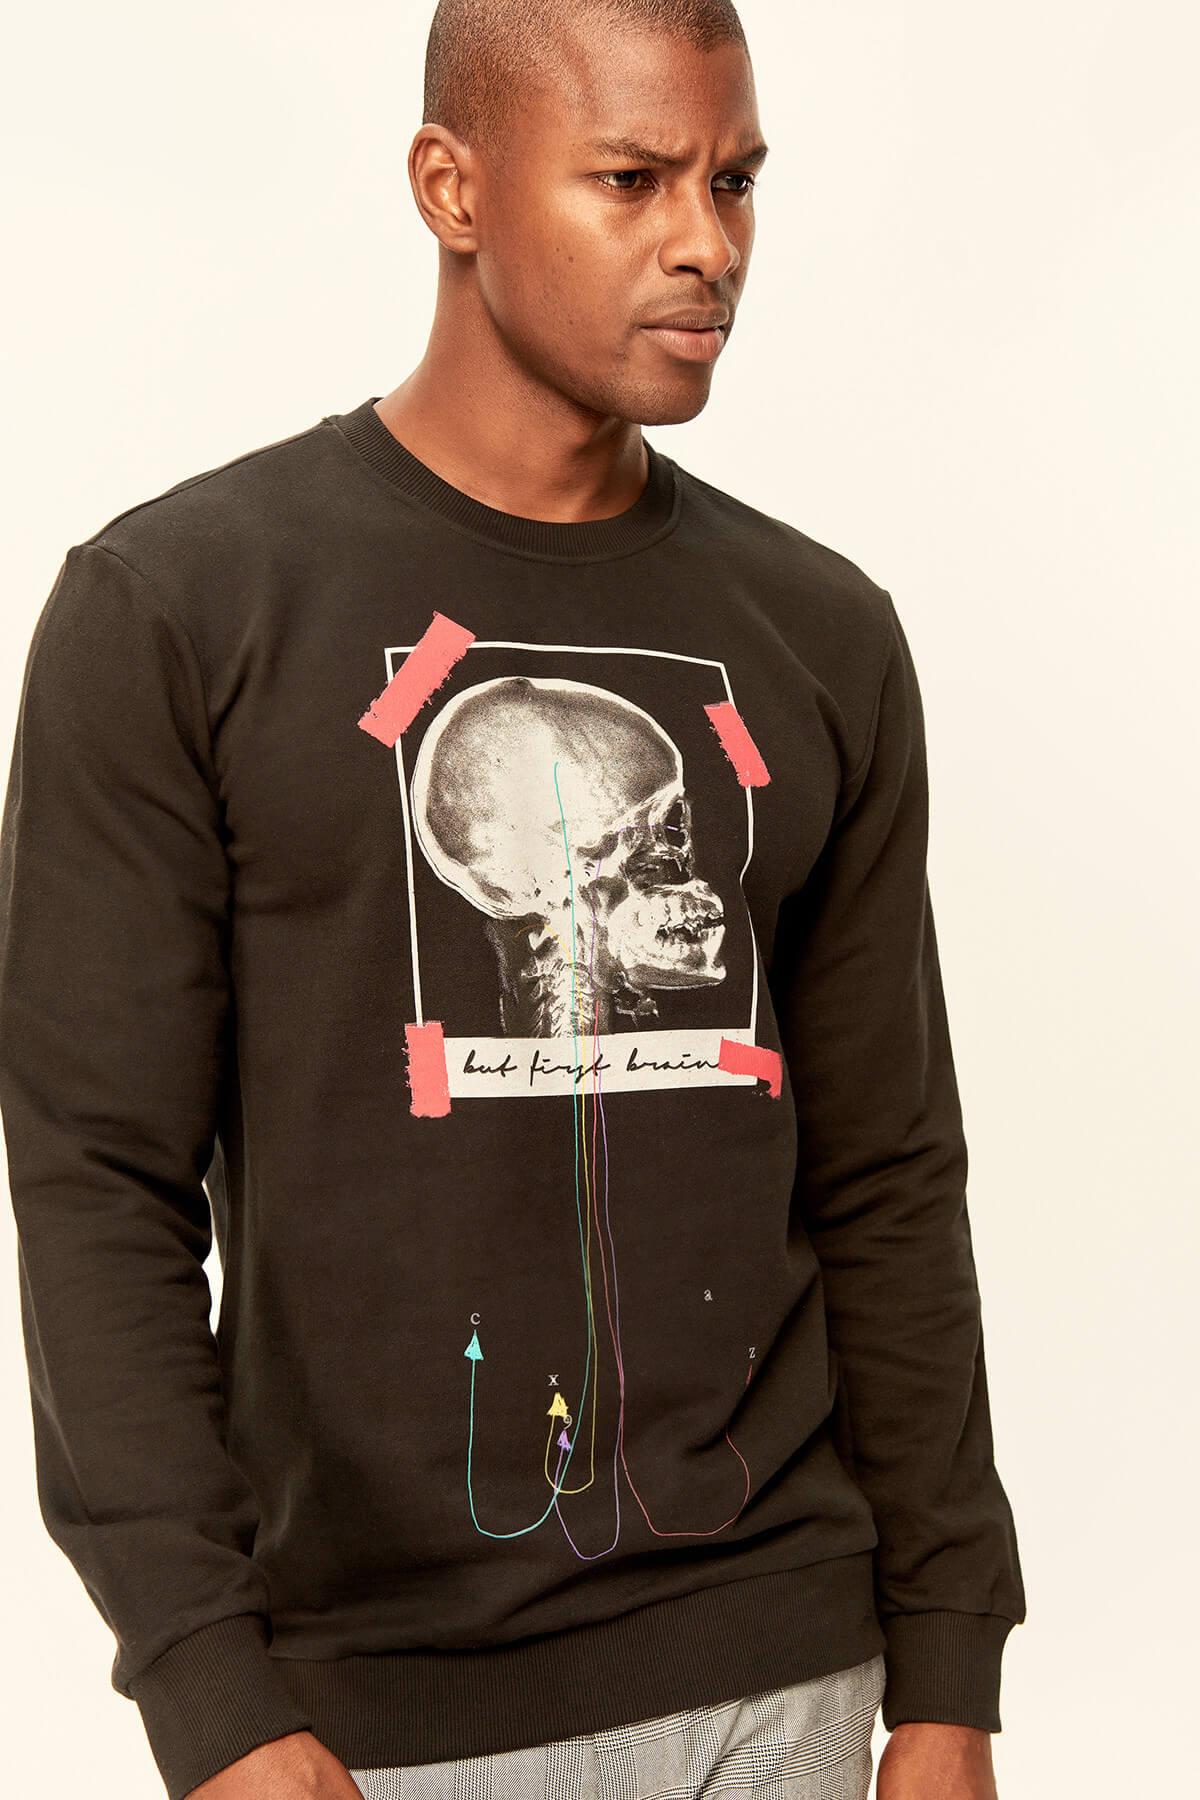 Trendyol Black Men's Sweatshirts-Graphic-Printed